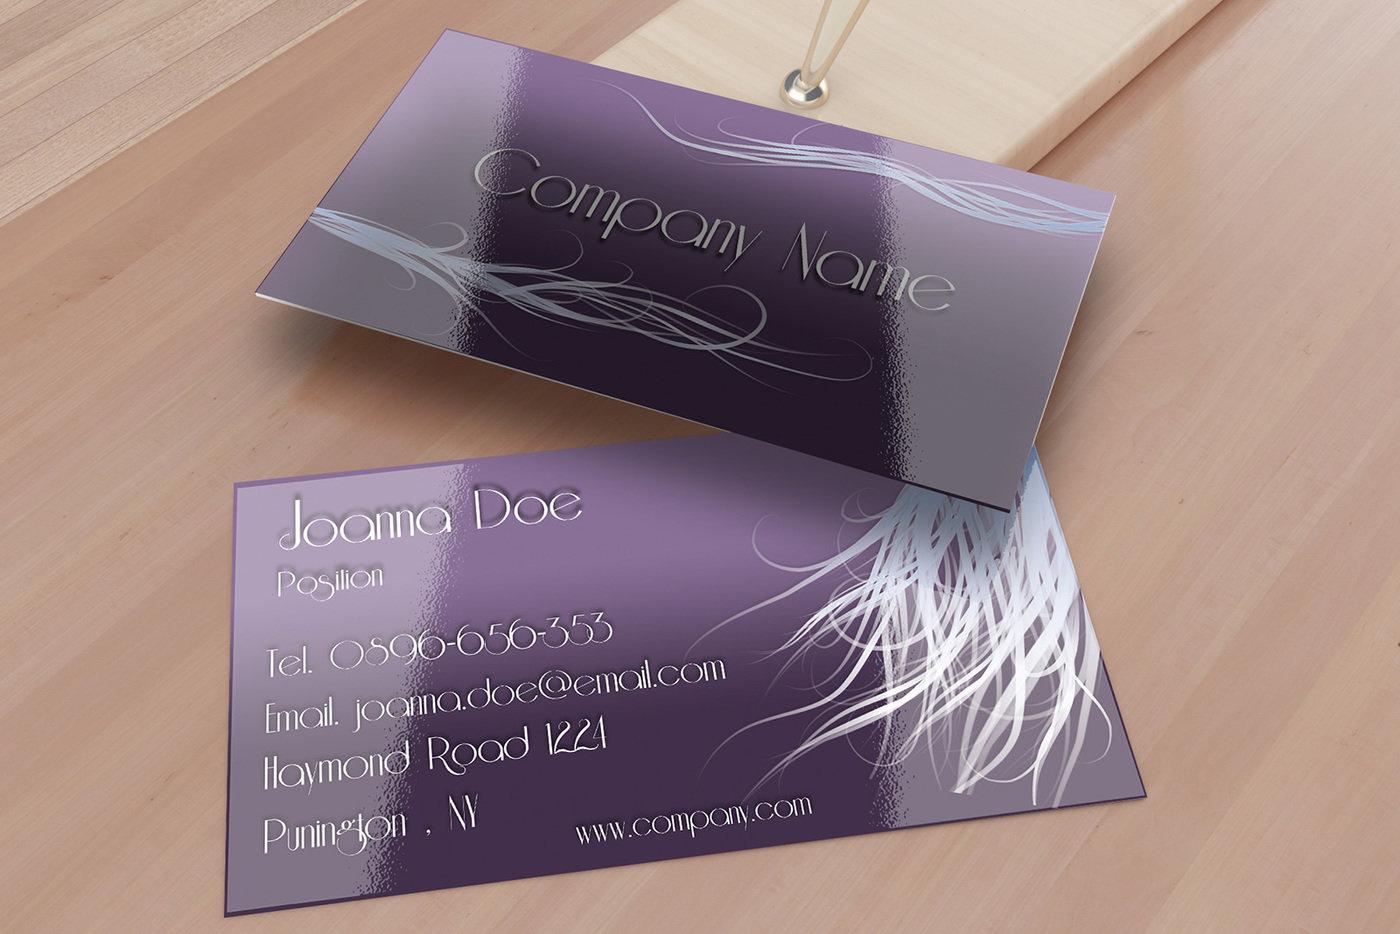 Hair Stylist Business Card Template By Borce Markoski At Coroflot Com